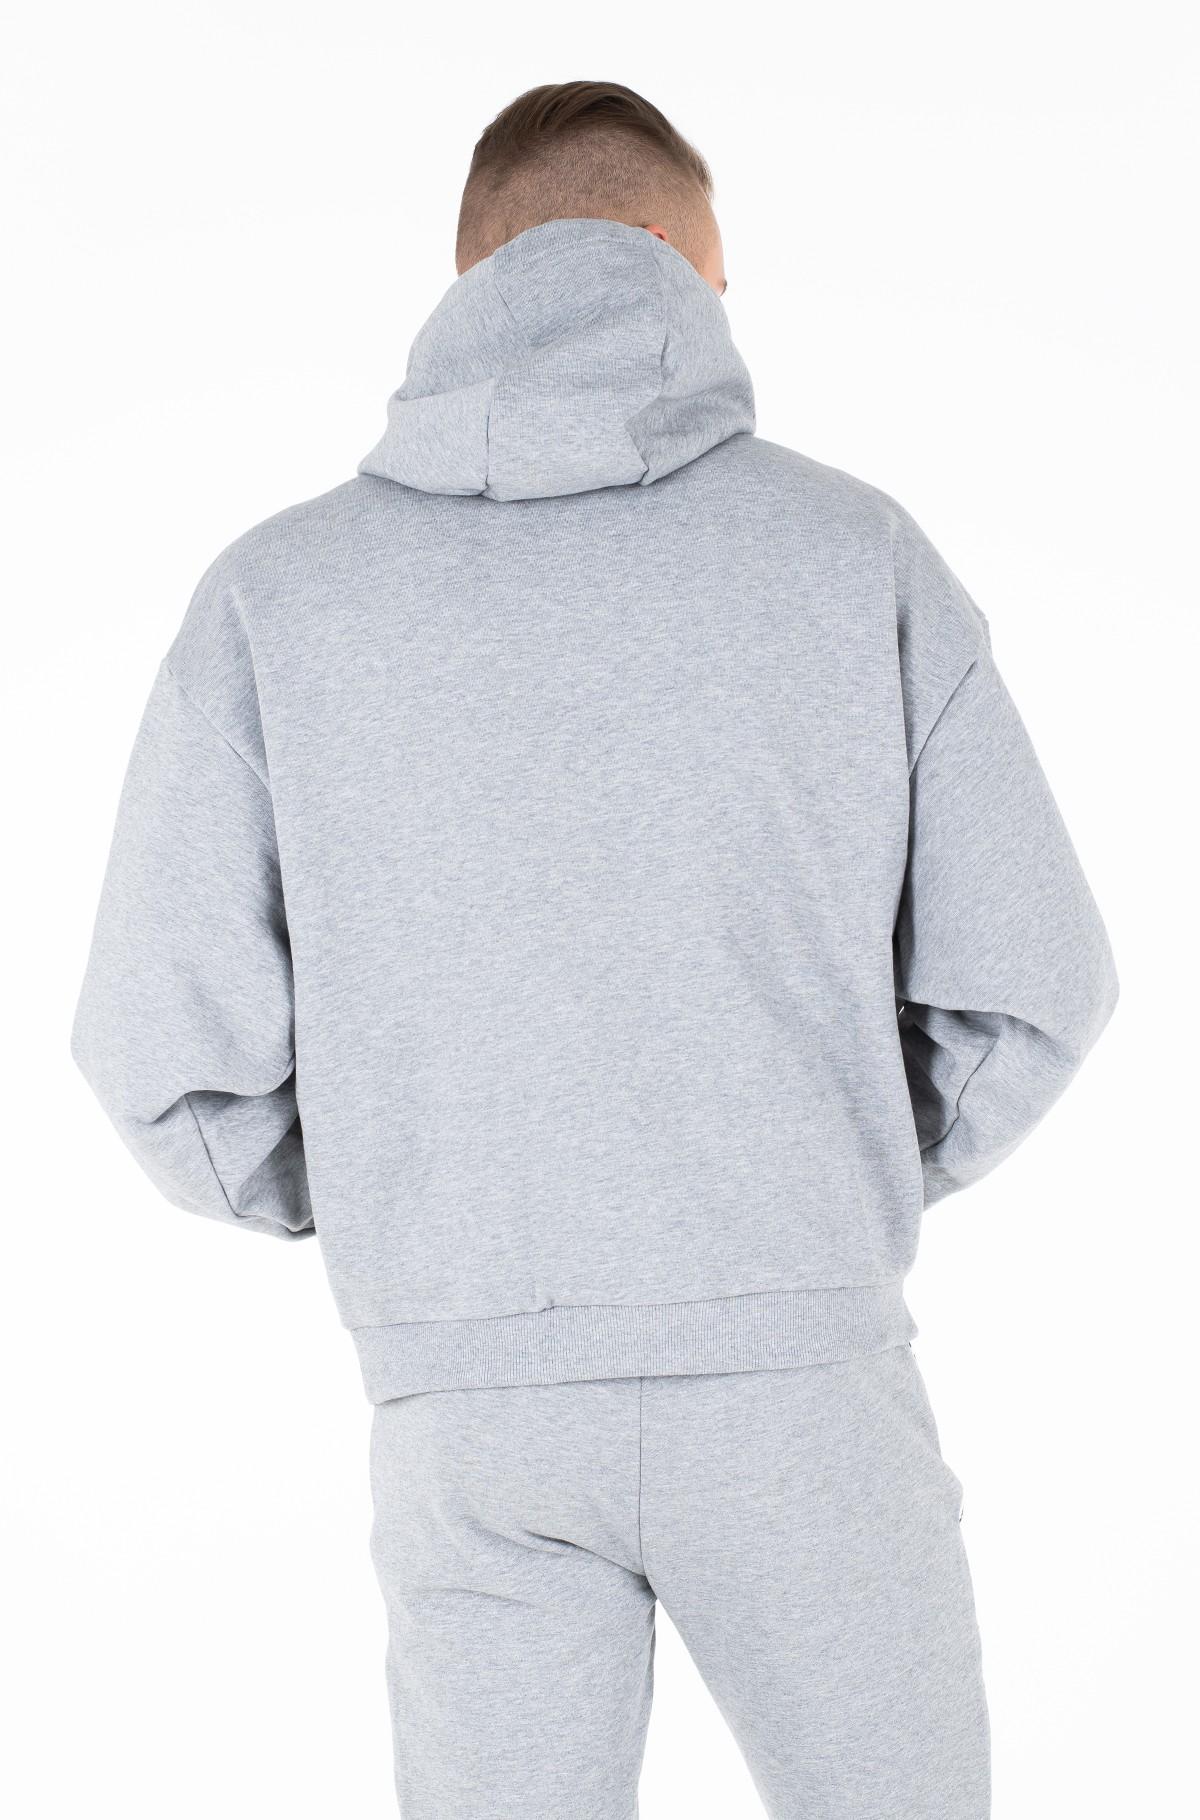 Sporta džemperis LH BASIC TAPE HOODY-full-2